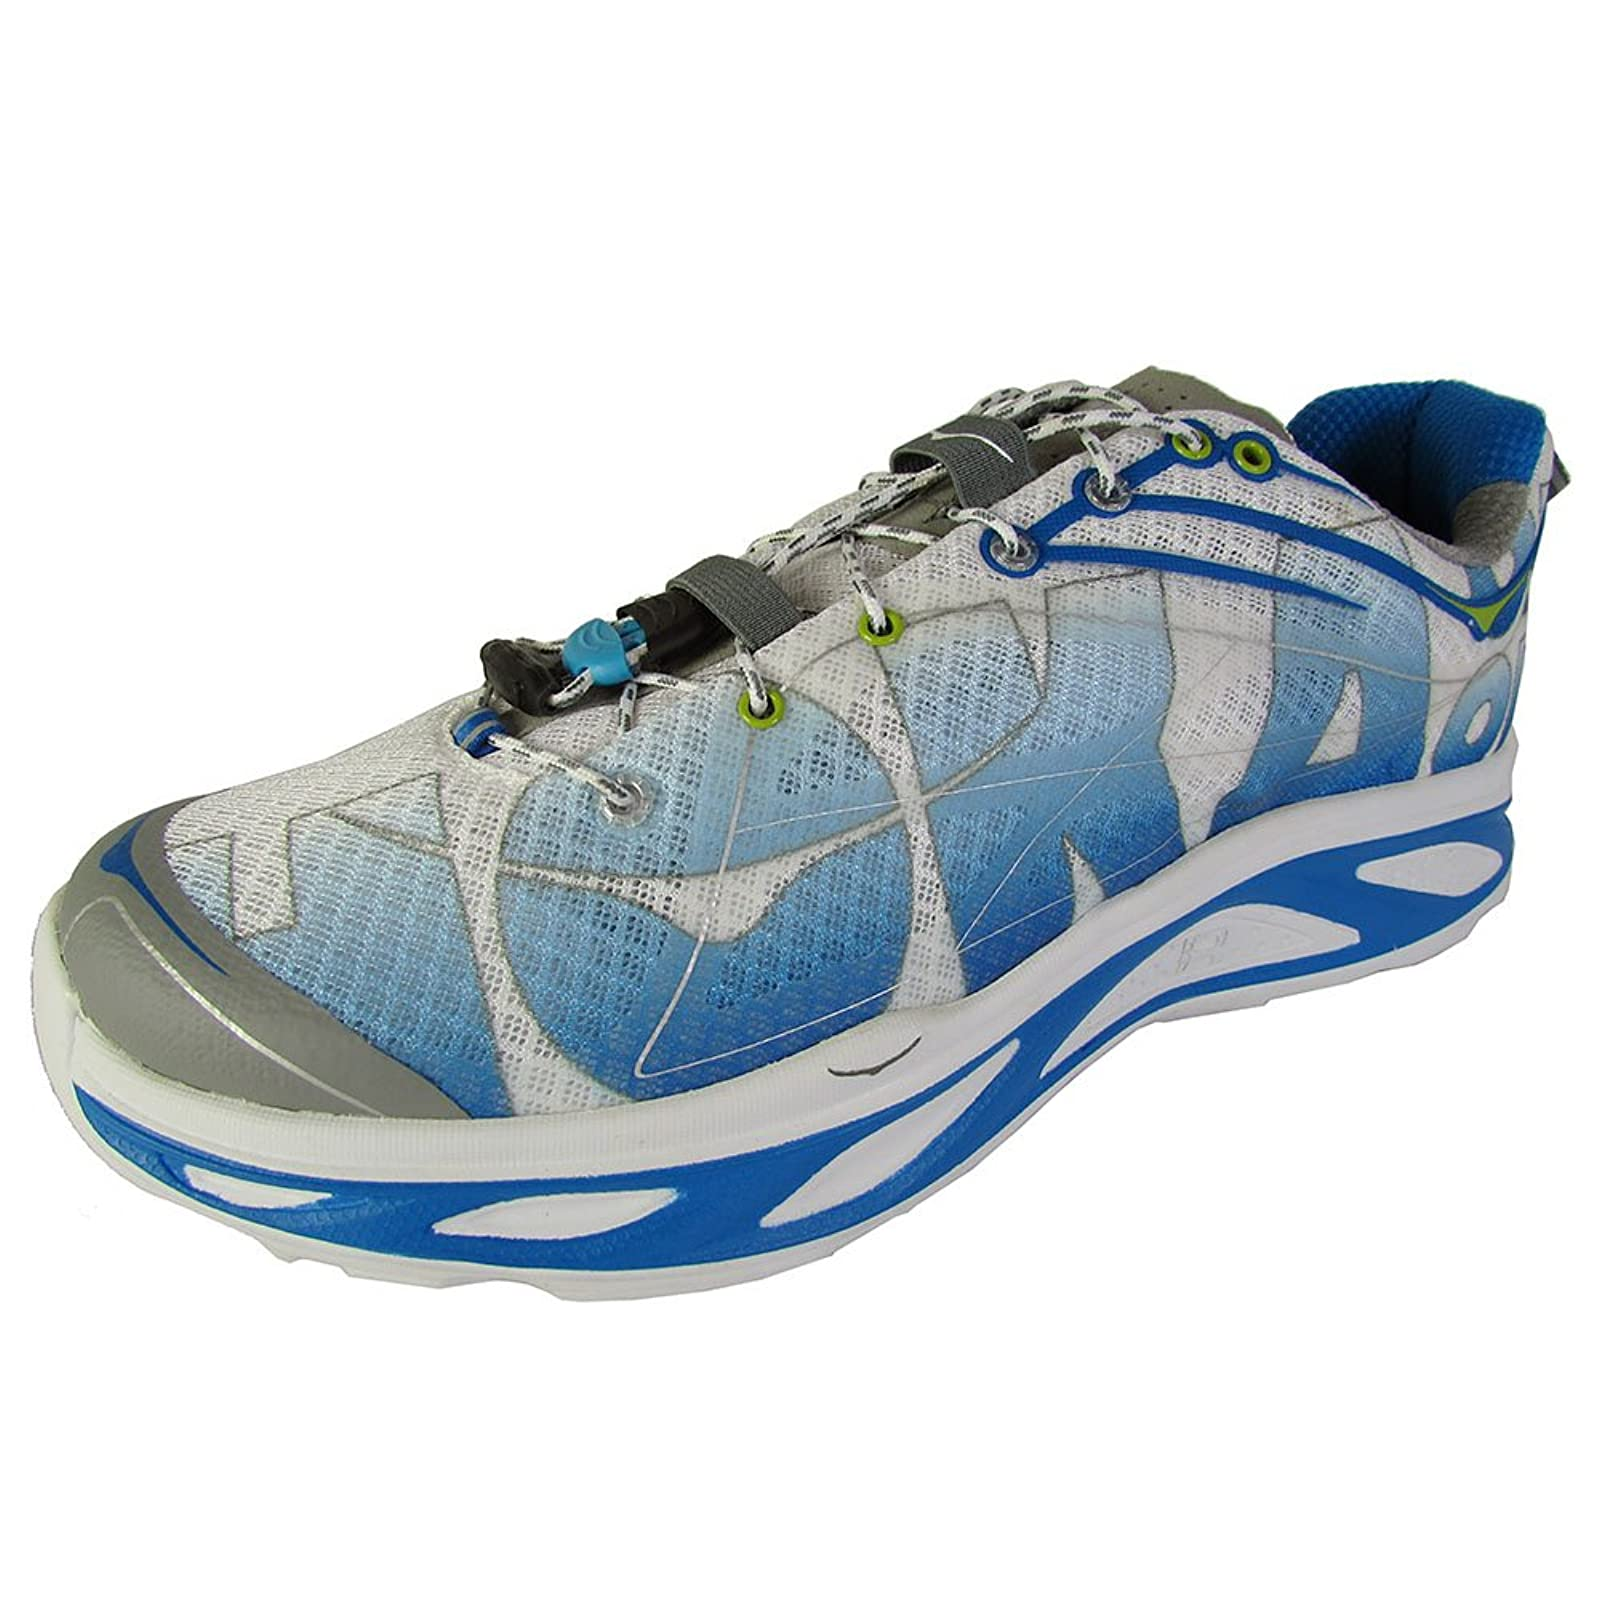 HOKA ONE ONE Mens Huaka Running Sneaker Shoe 8 M US - 1